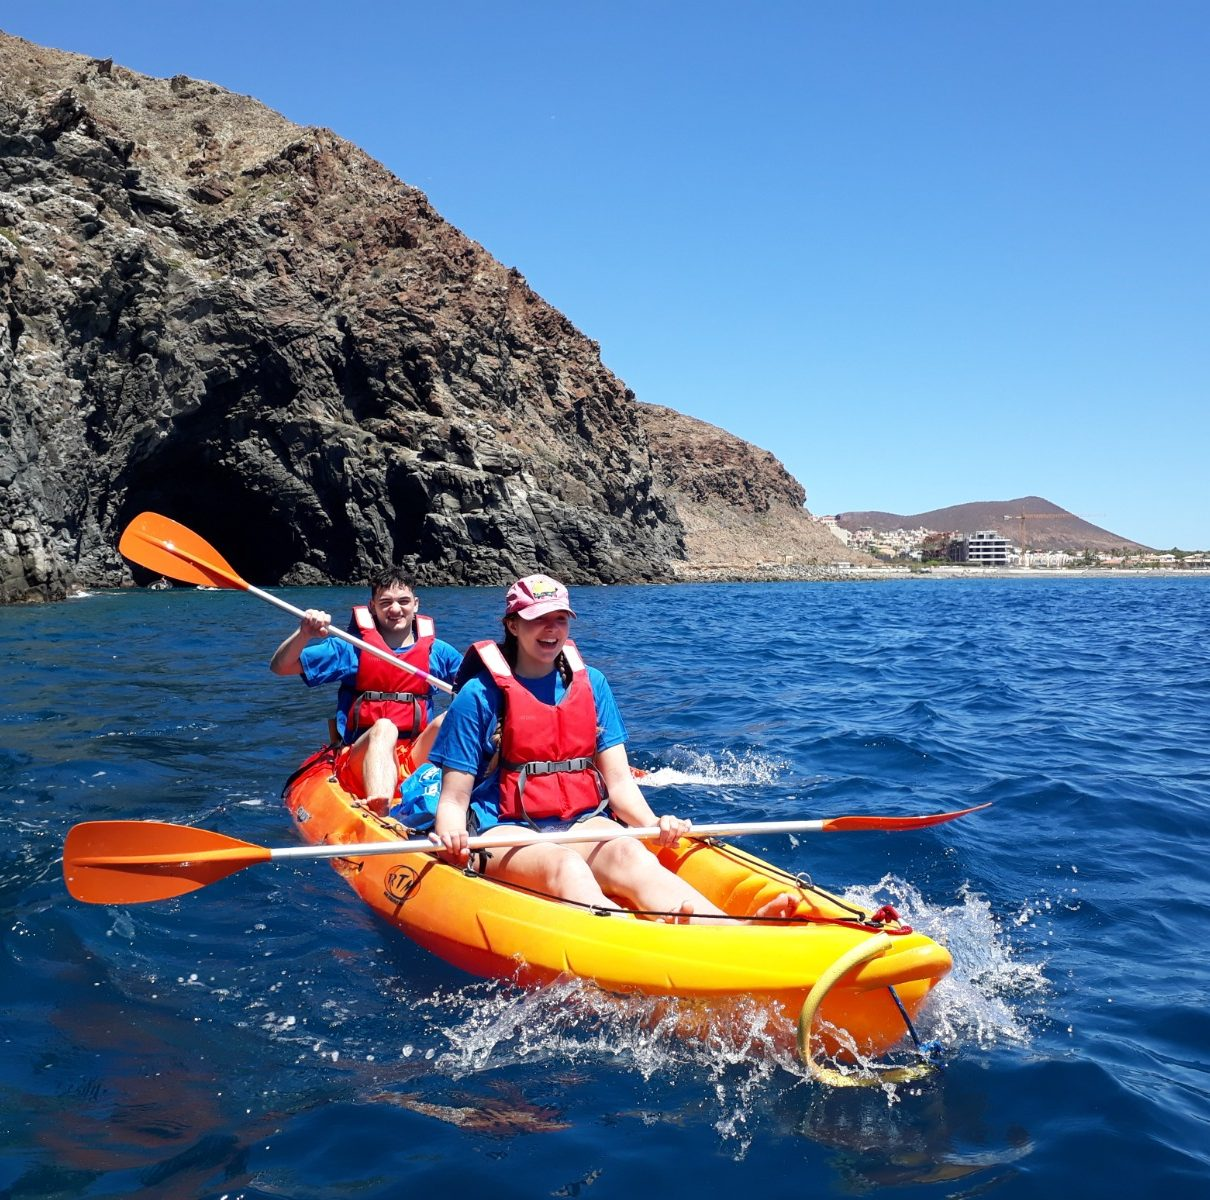 Kayak Academy Tenerife- Kayak Adventure with dolphins and